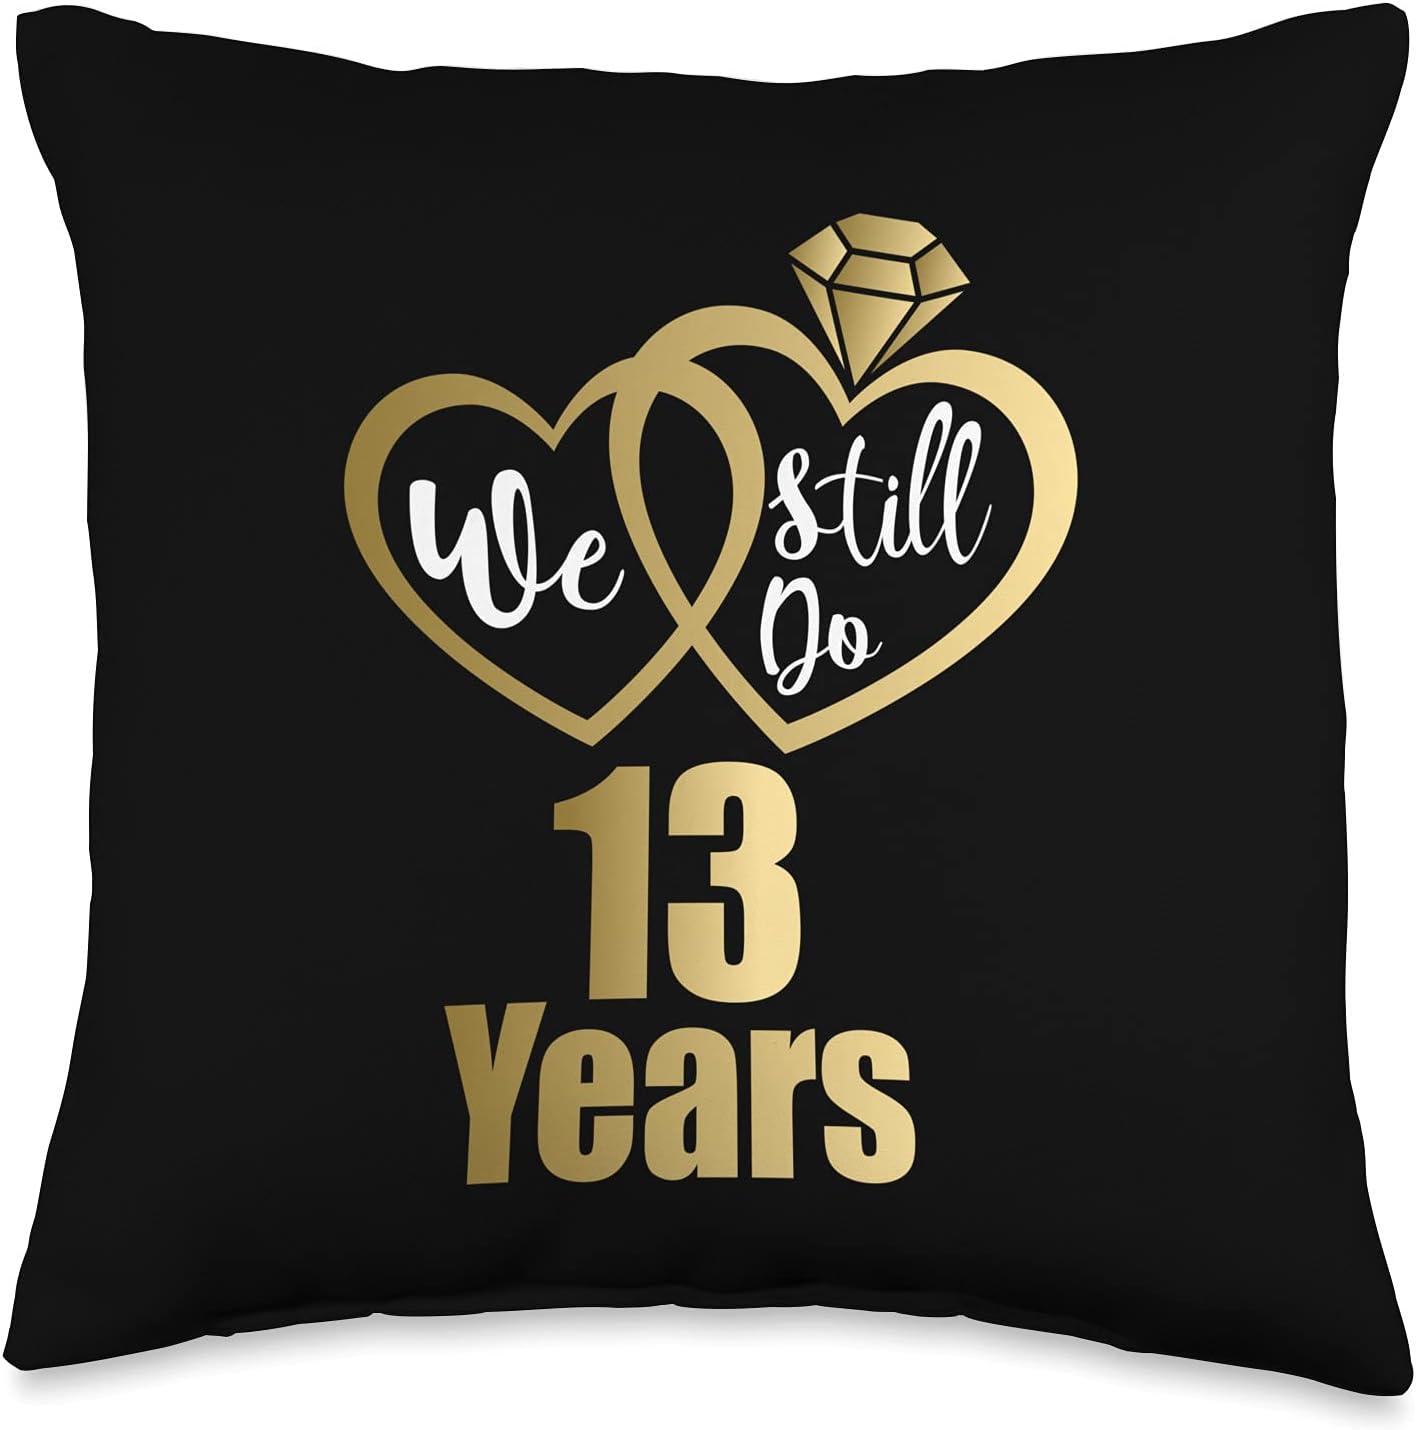 Romantic Wedding Industry No. 1 Anniversary Gift For Couple Still We Bombing new work do Ye 13